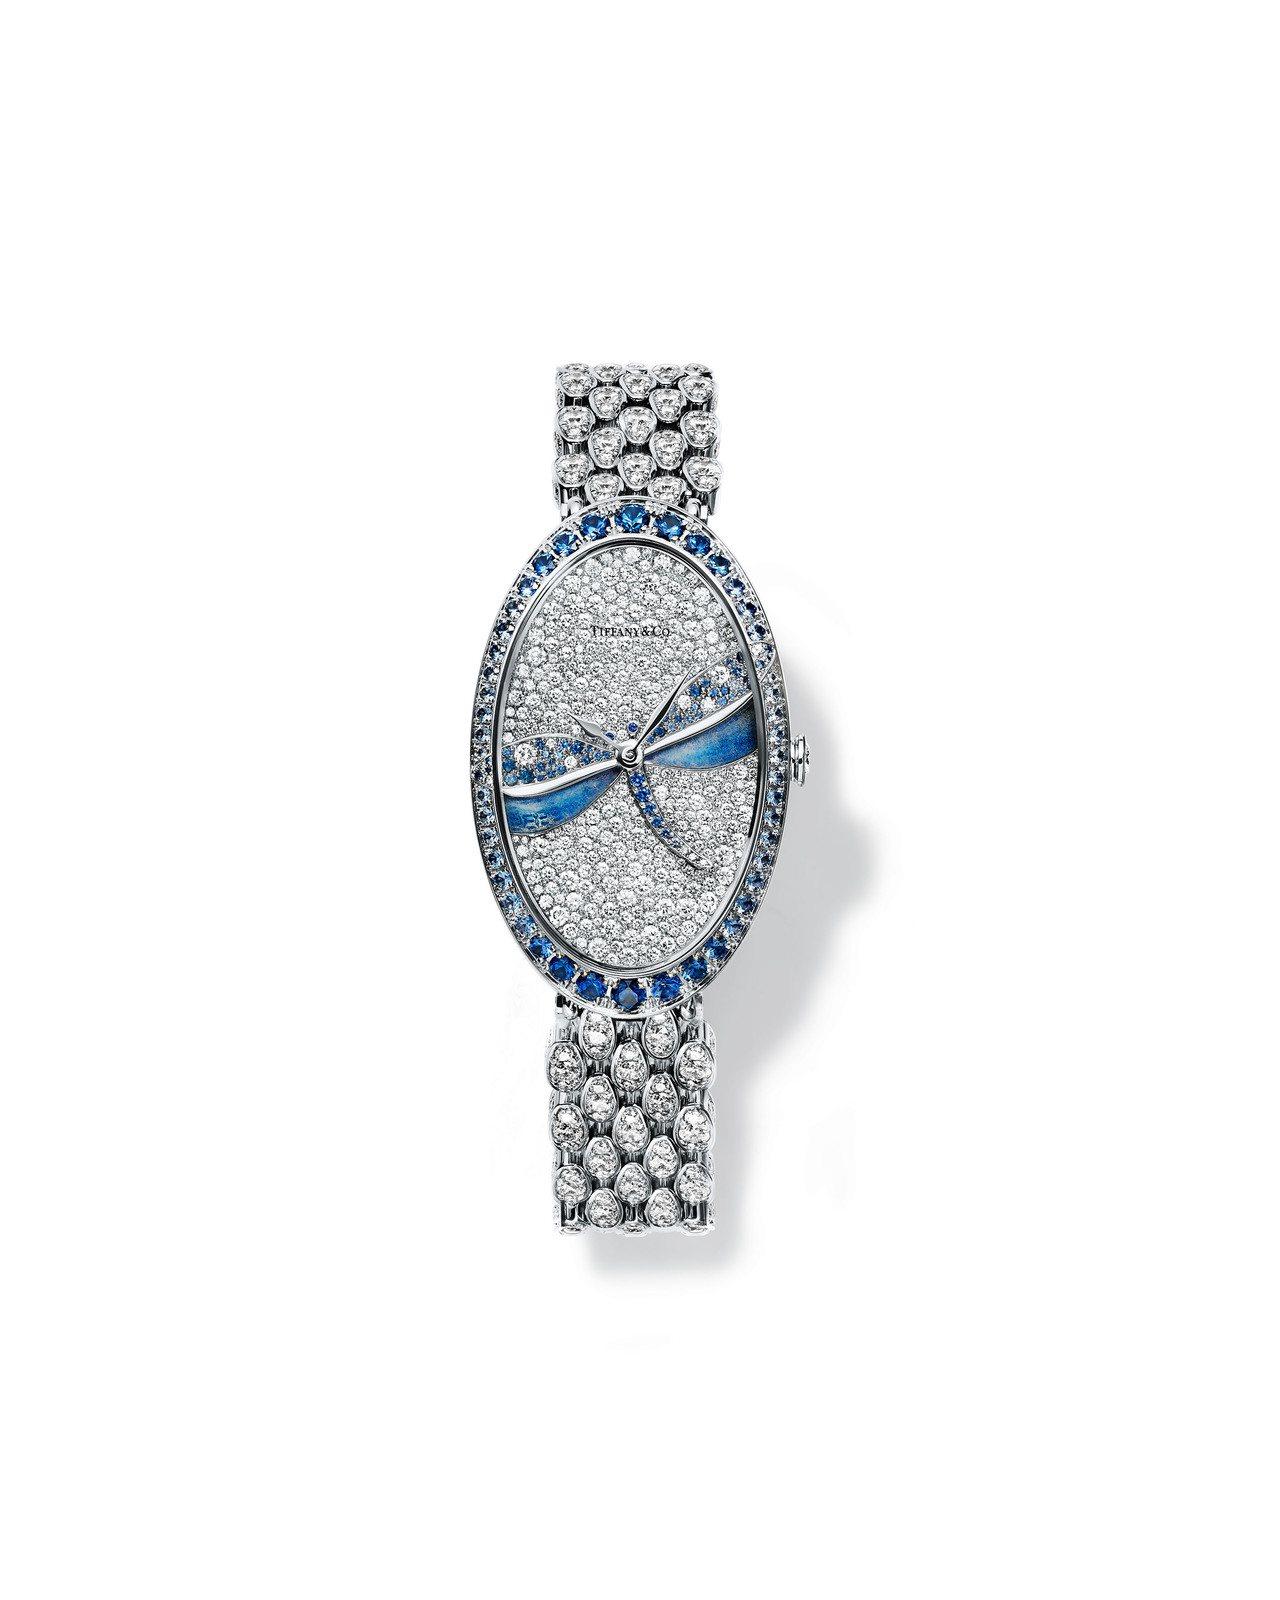 2017 Blue Book系列腕表,表盤鑲飾51顆圓形切割淺藍色剛玉的蜻蜓,採...